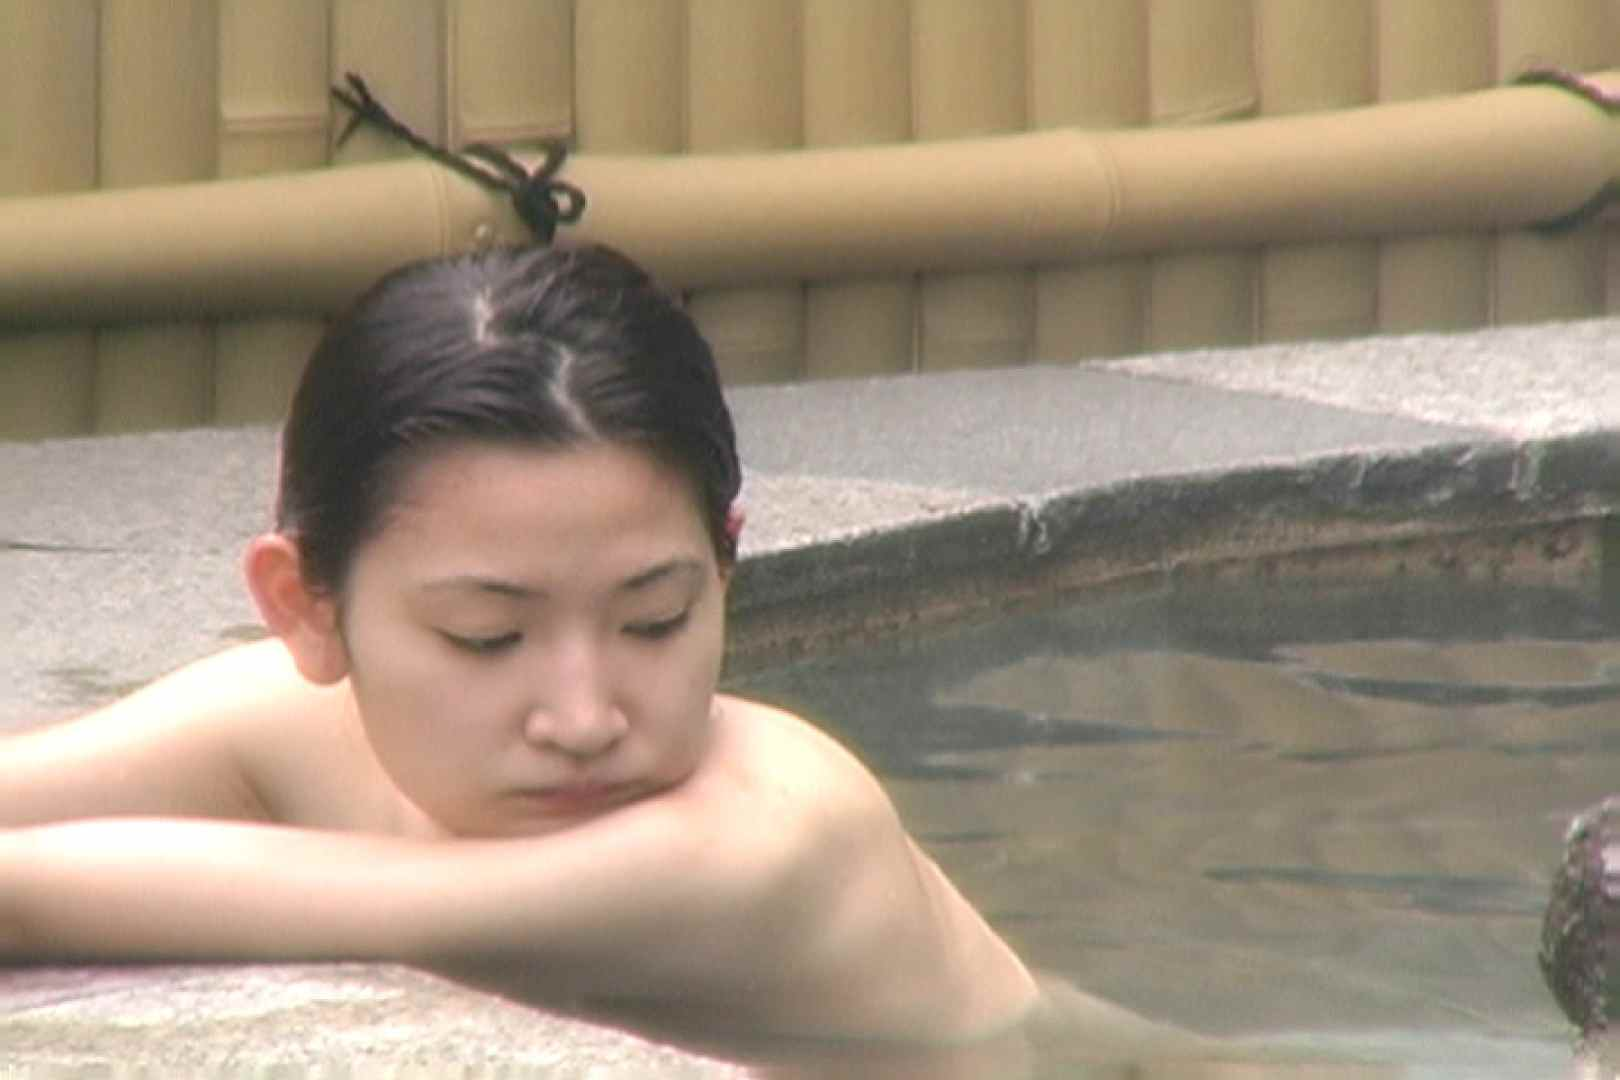 Aquaな露天風呂Vol.637 盗撮シリーズ | 露天風呂編  87PIX 67